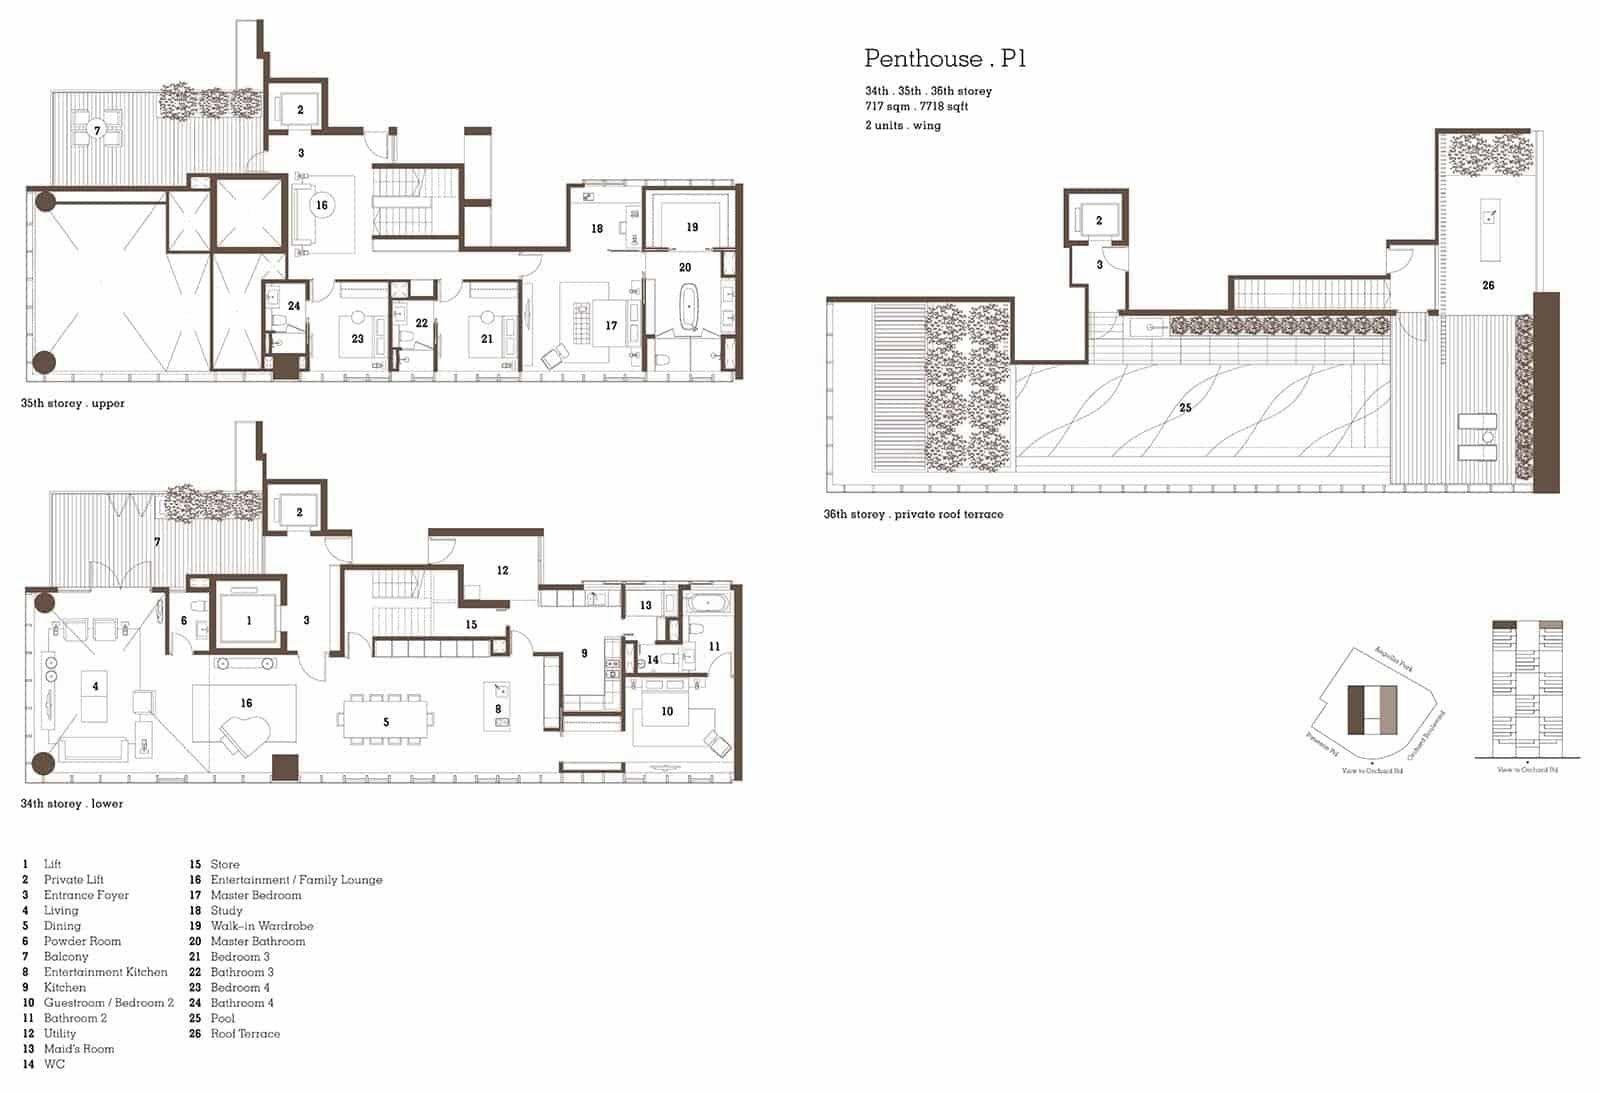 Twentyone Anguilla Park Singapore Penthouse Pent House Floor Plans Condominium